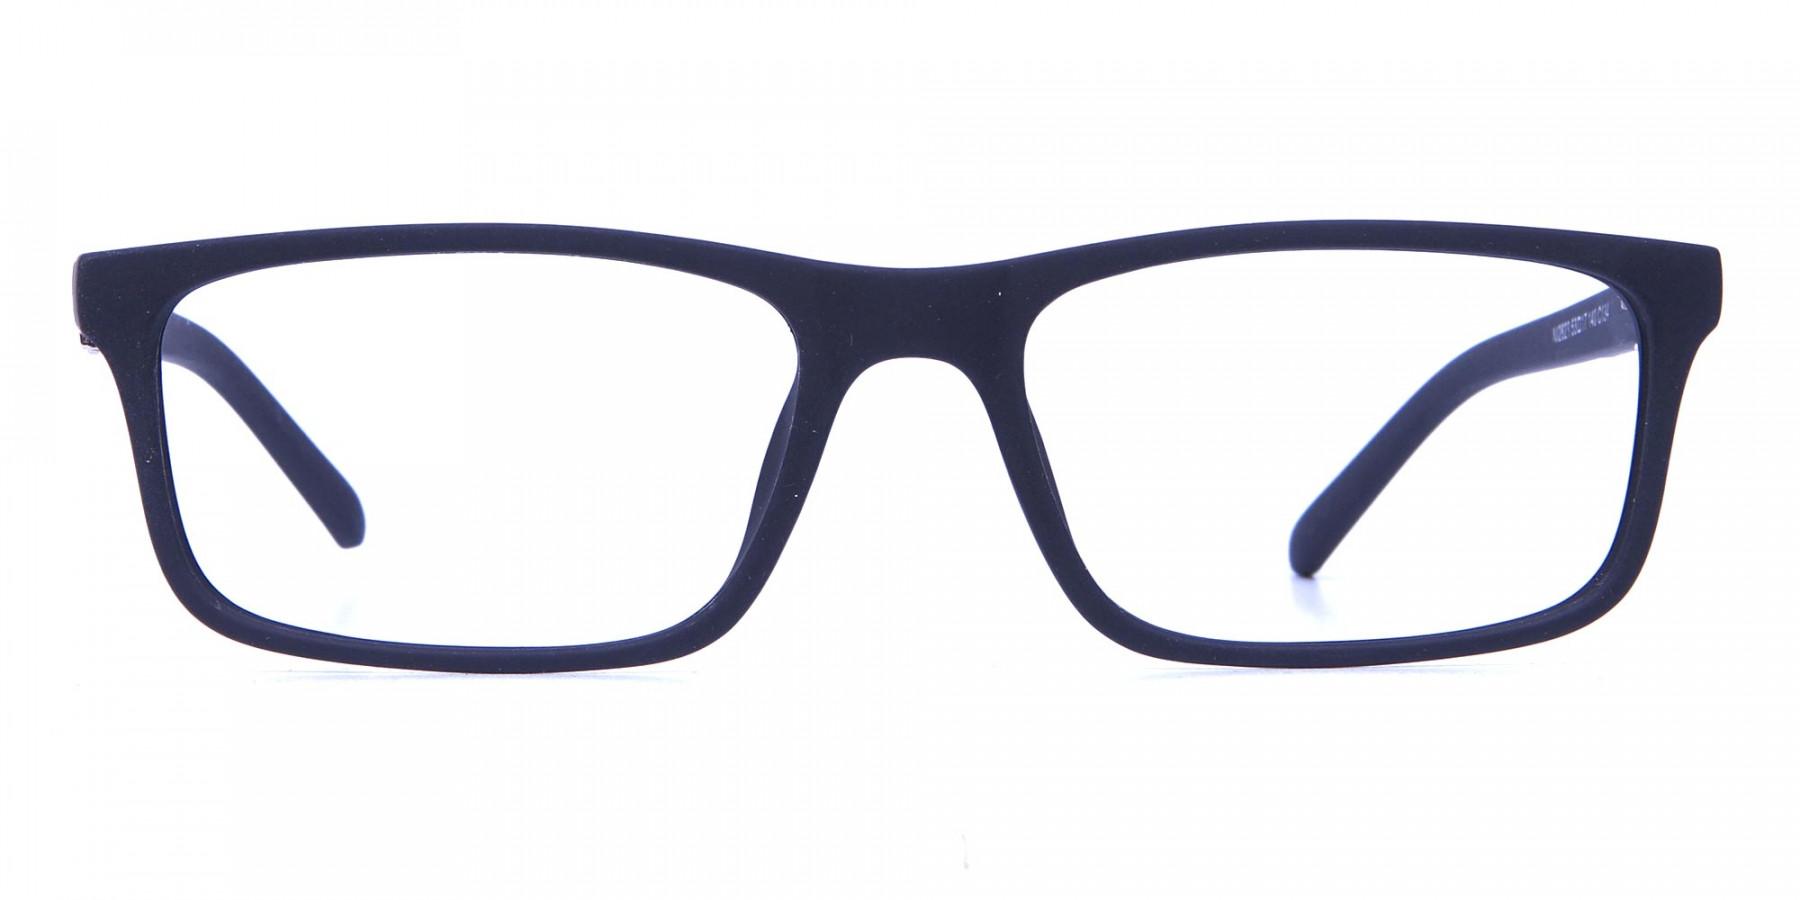 black Wayfarer eyeglasses